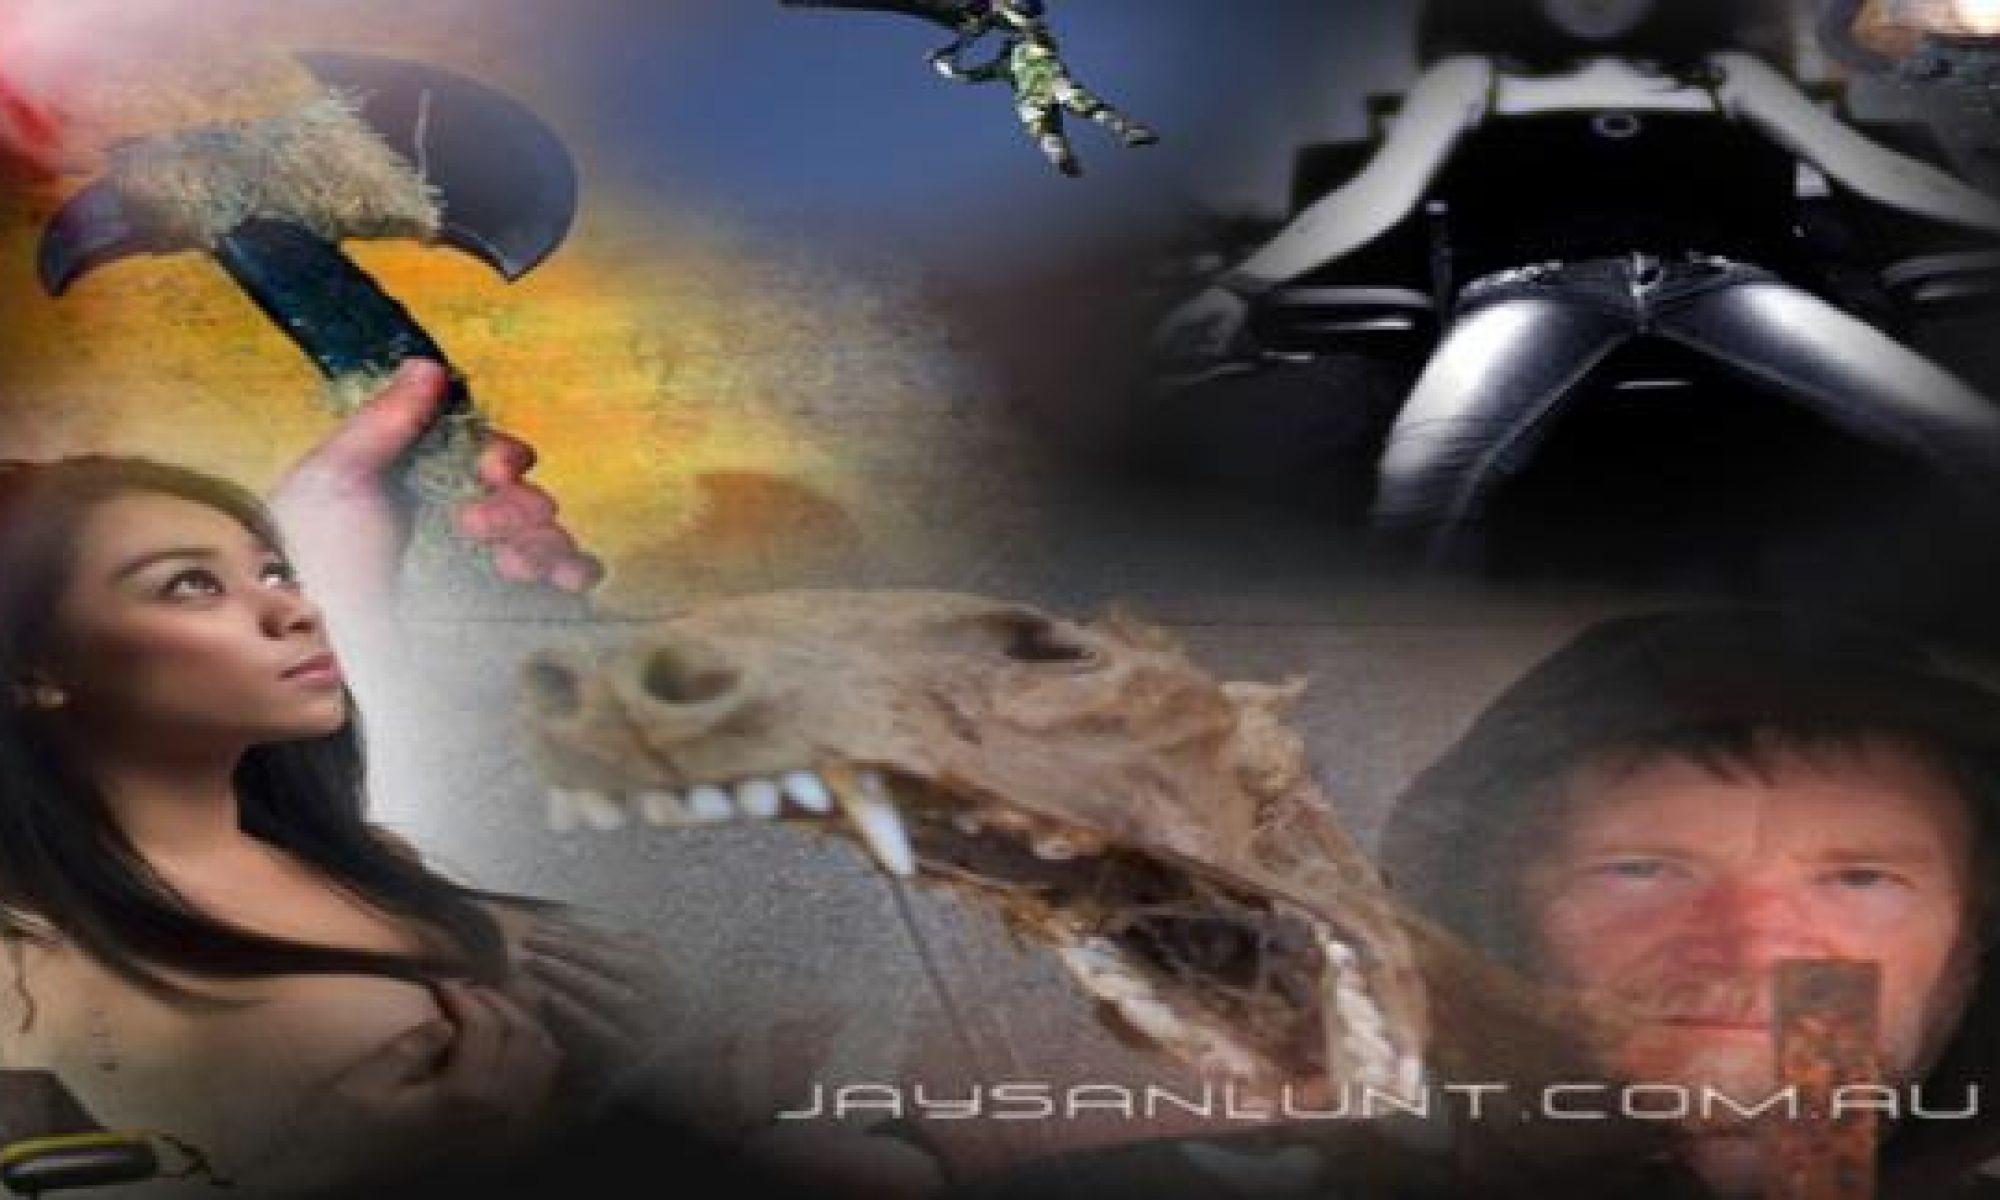 Jaysan Lunt